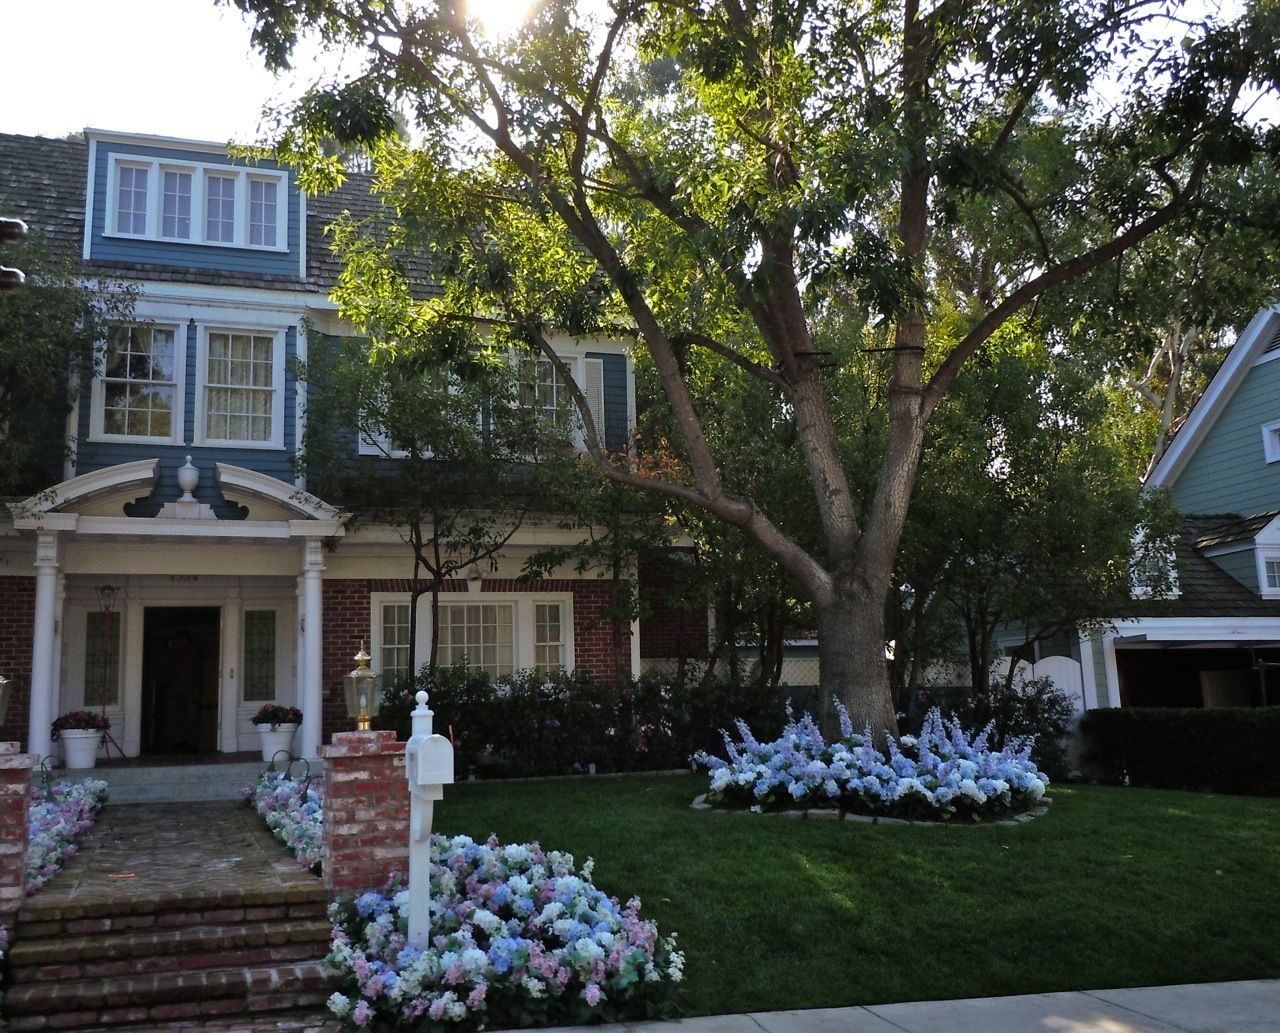 bree house wisteria lane desperate housewives jardin d. Black Bedroom Furniture Sets. Home Design Ideas